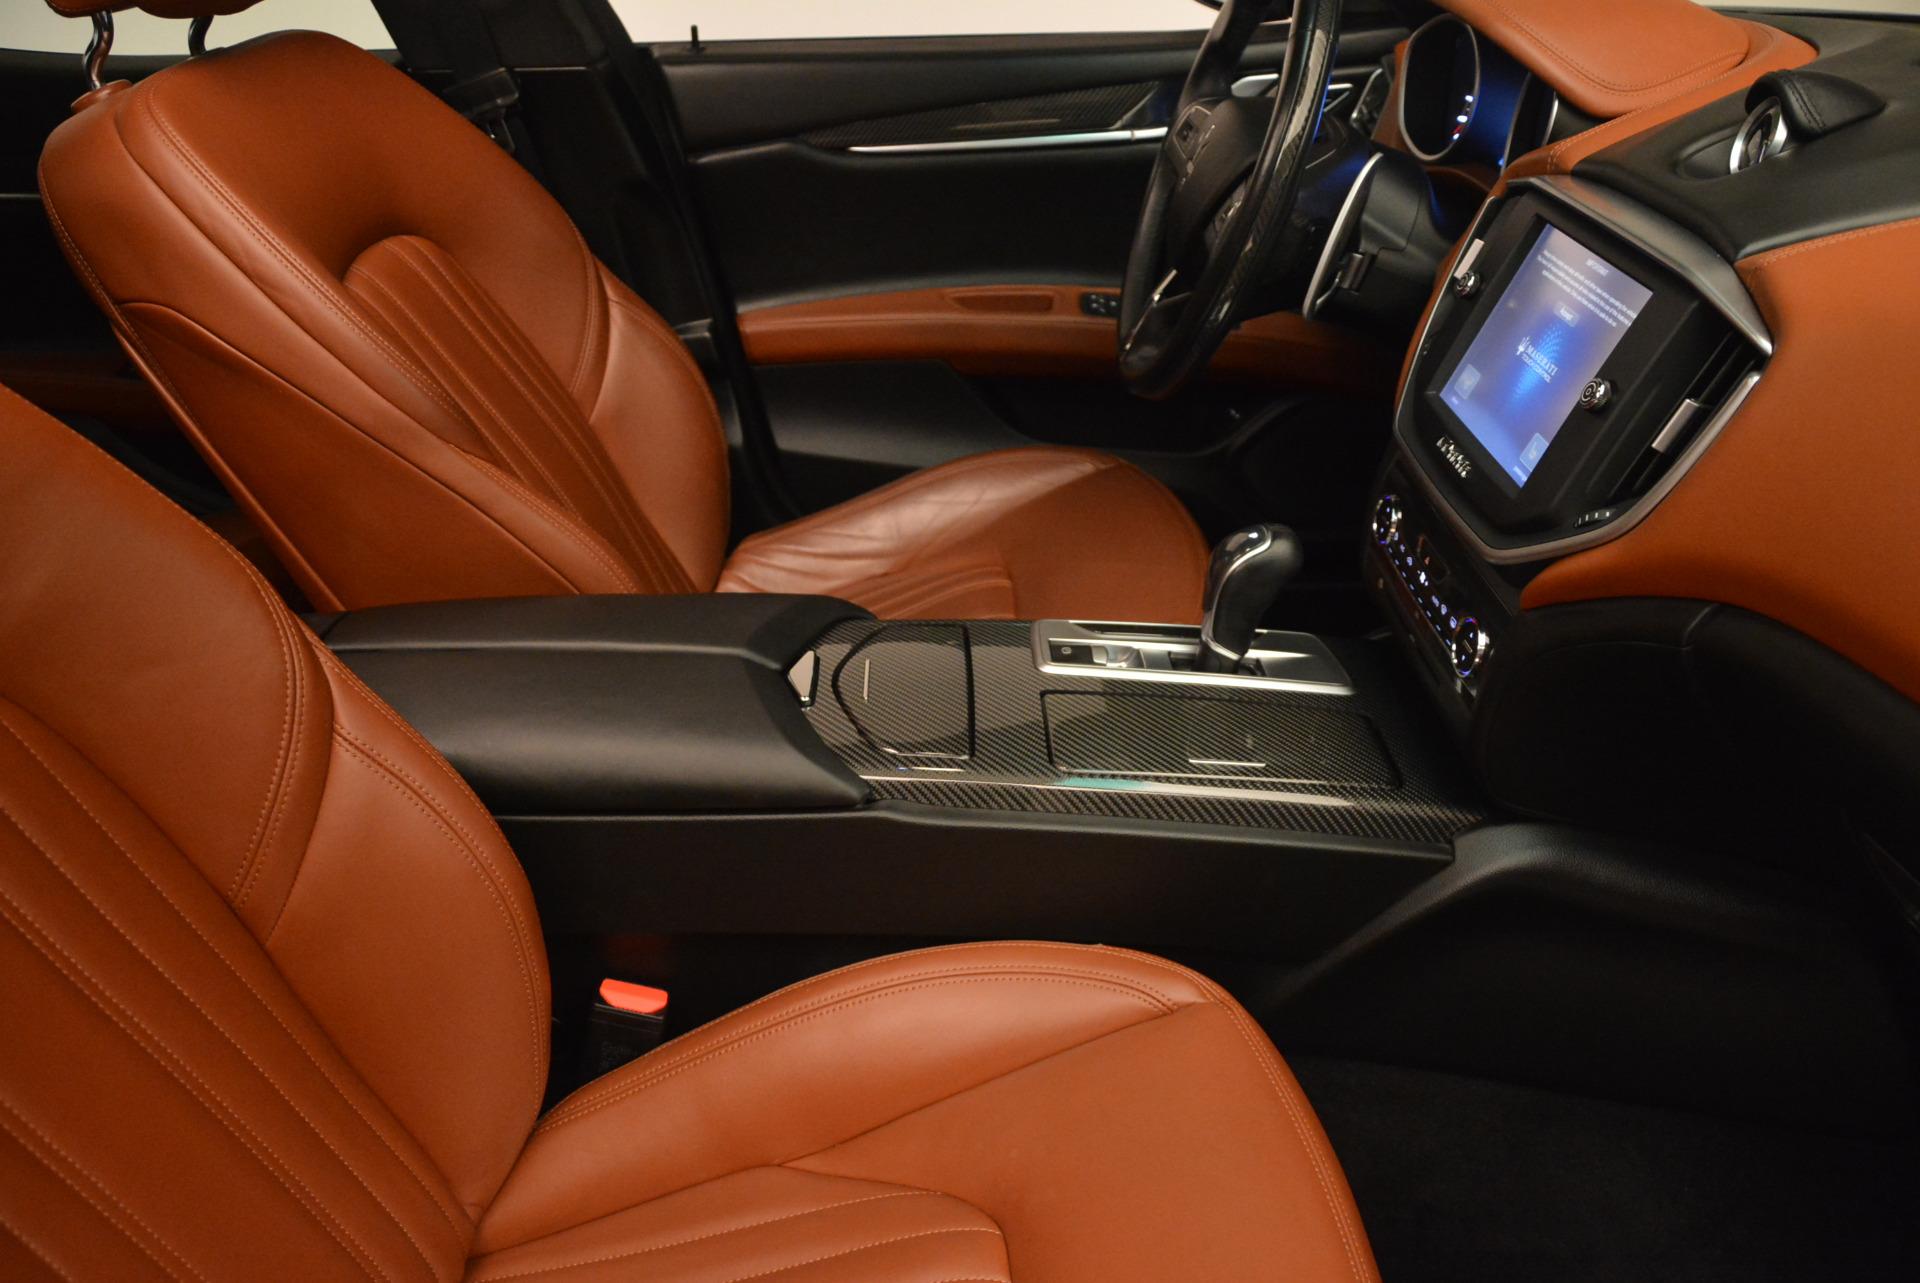 Used 2014 Maserati Ghibli S Q4 For Sale In Westport, CT 805_p21